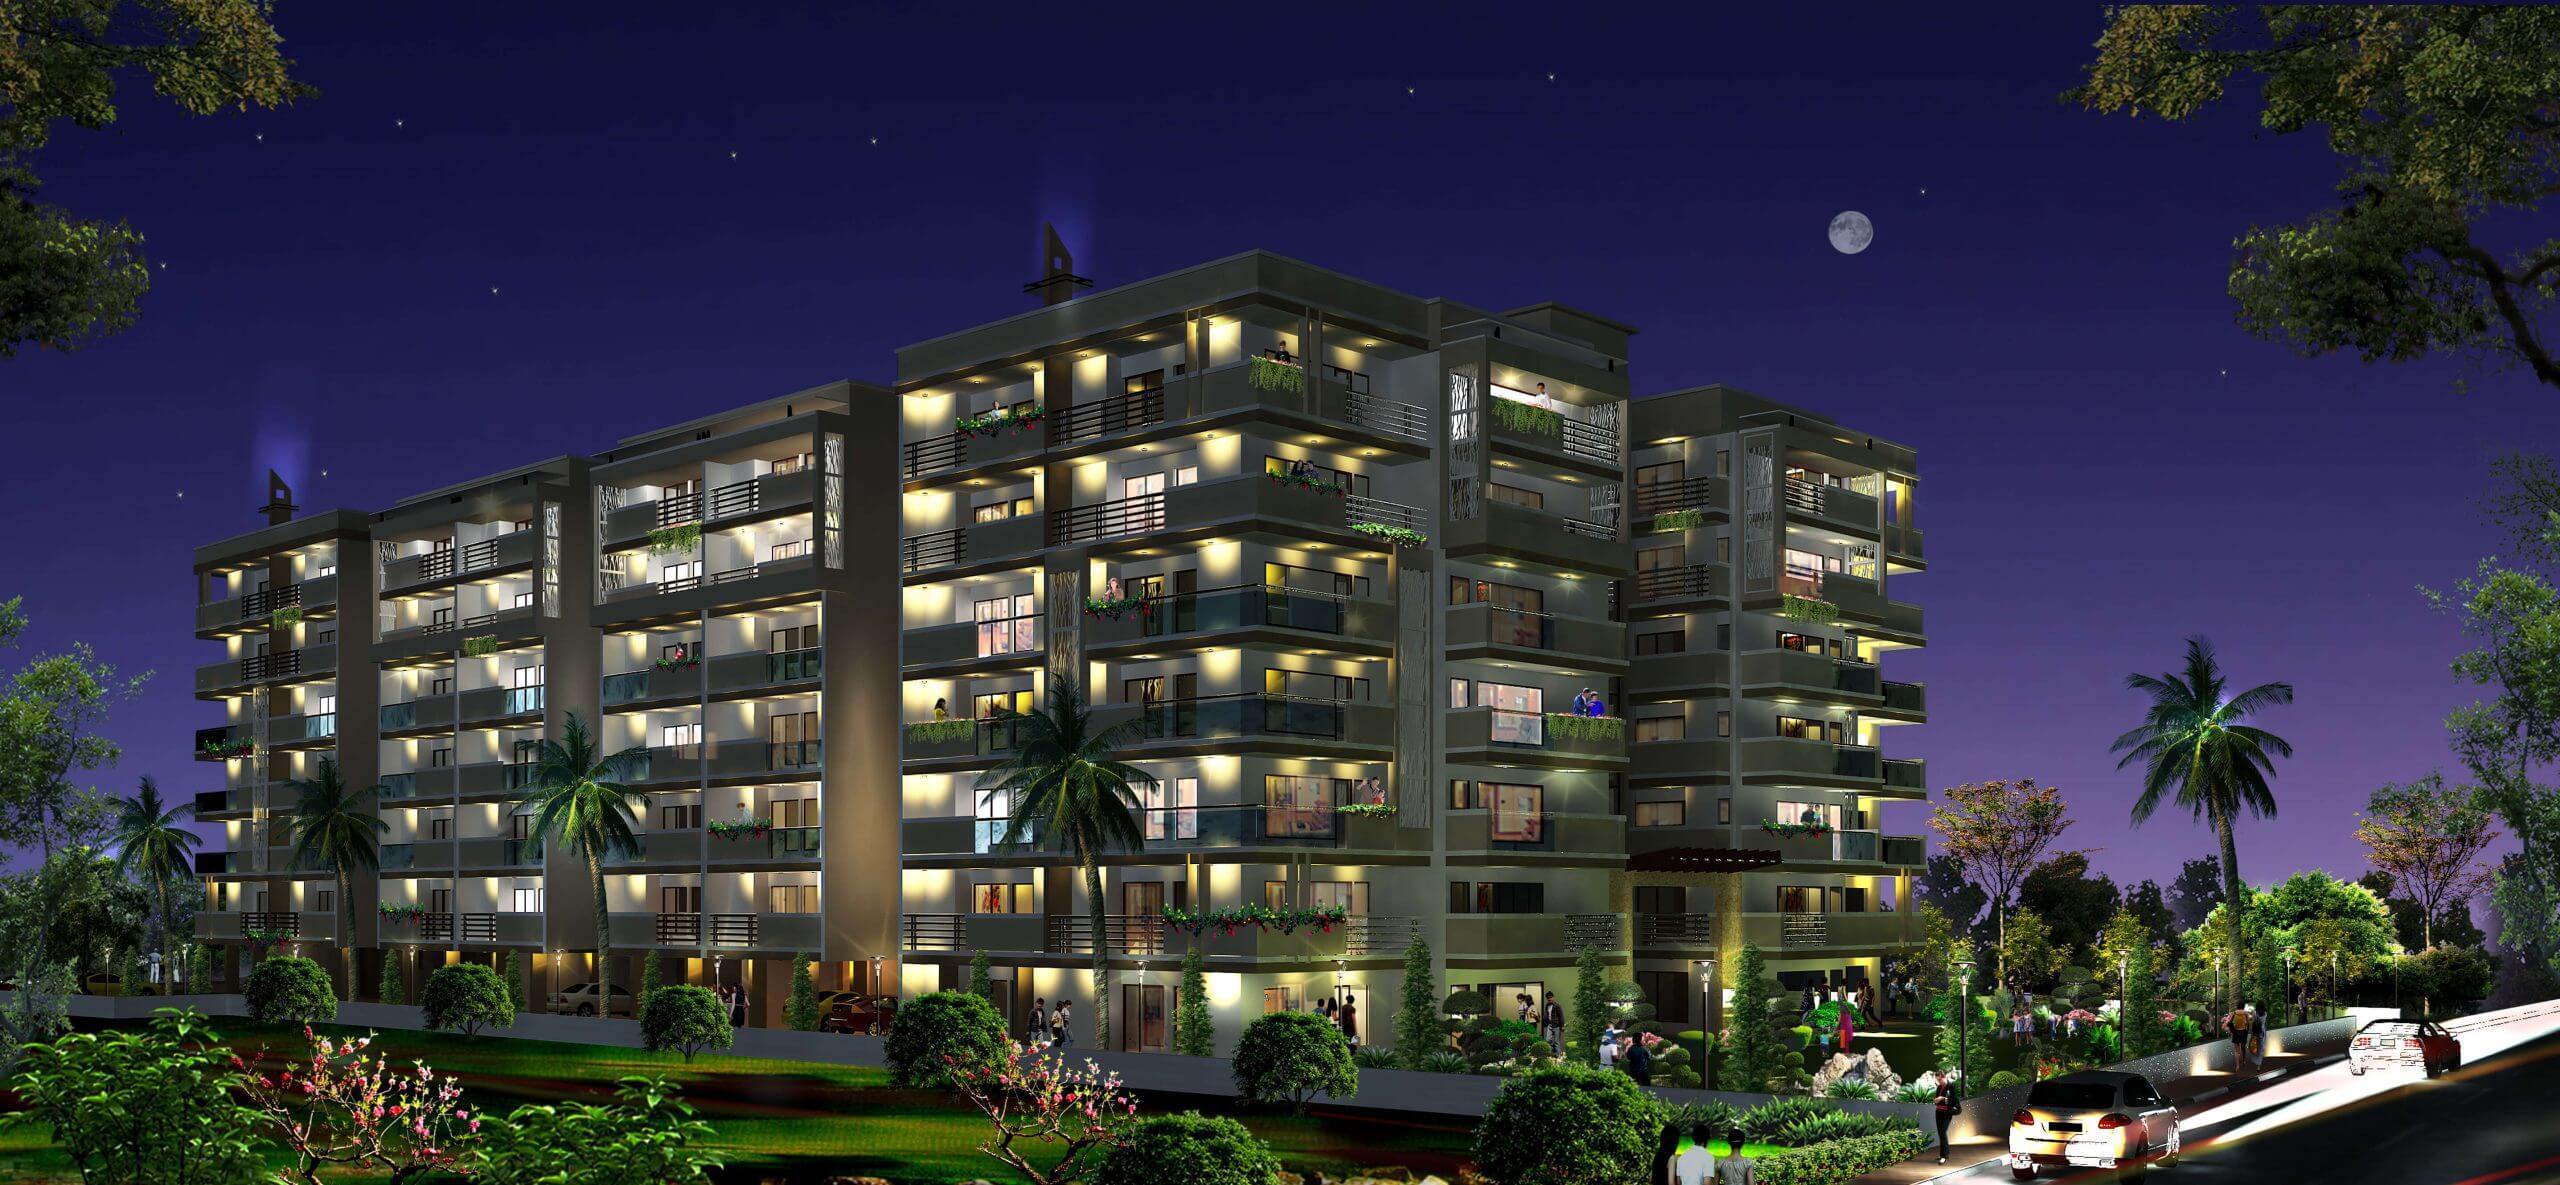 Maxvel Residency - Flats in Dehradun